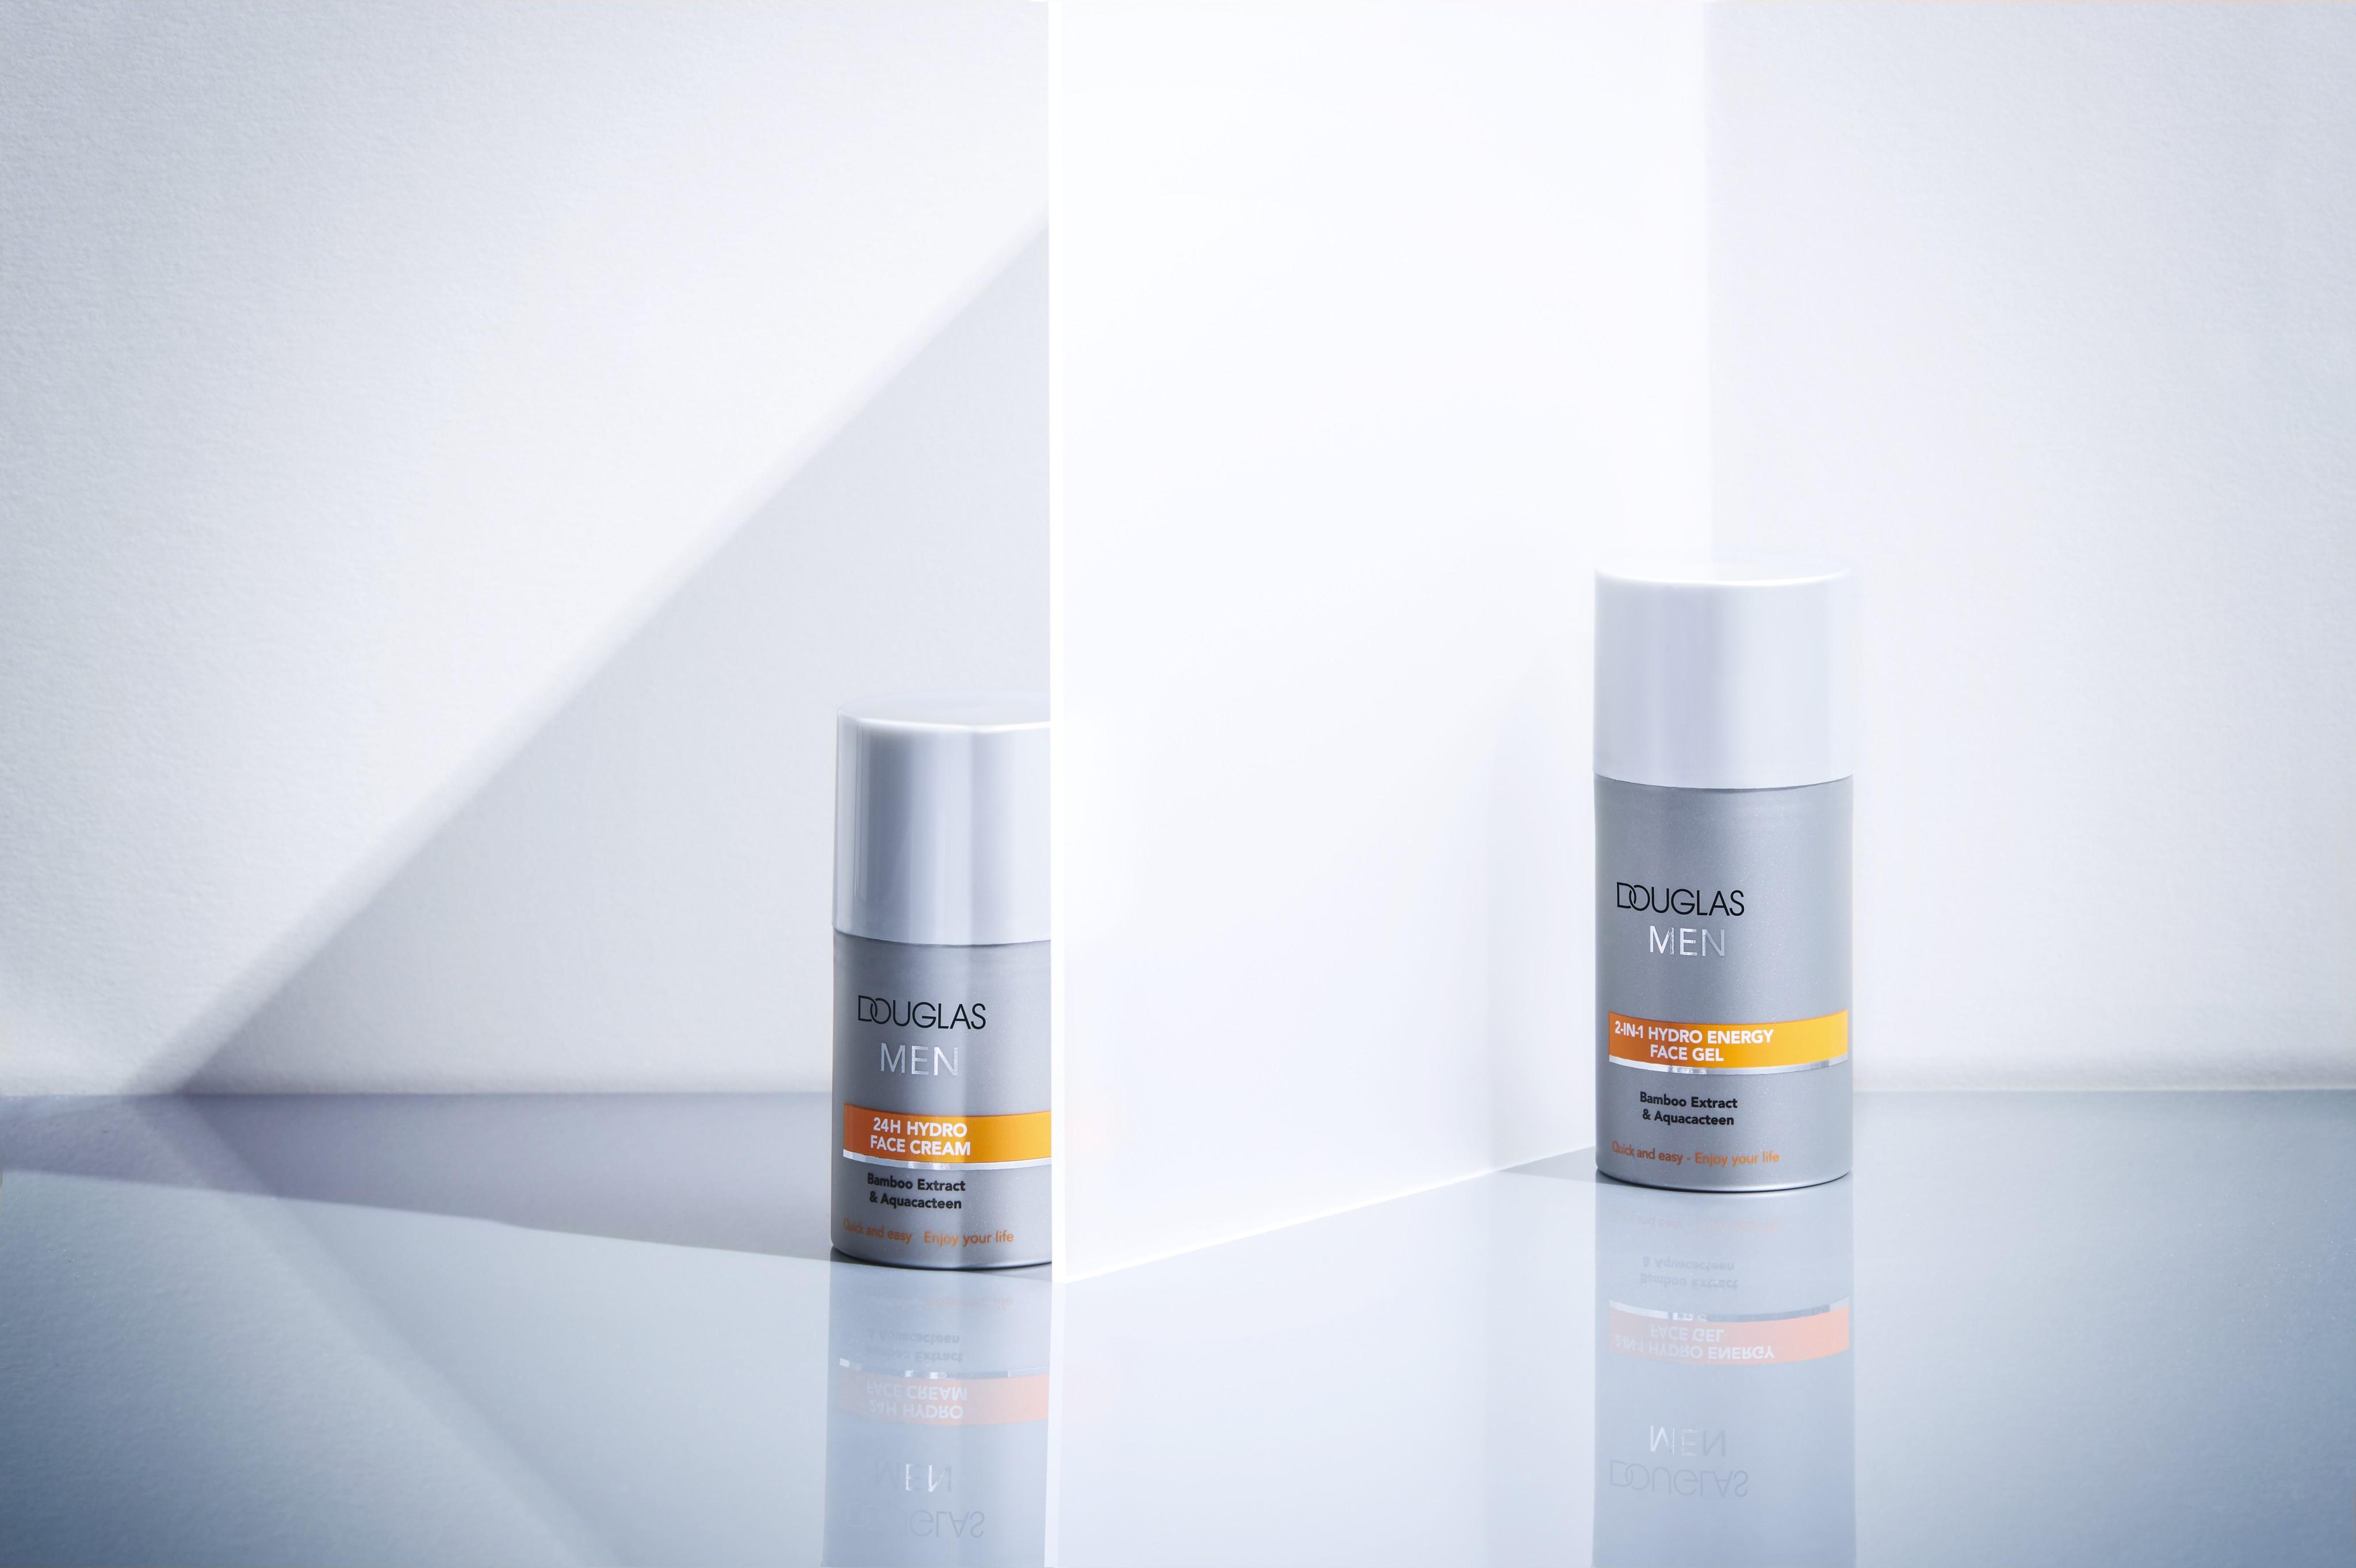 Skincare-product-vitamin-e-milky-glass-plate-douglas-men-unlimited-Web-Rendition